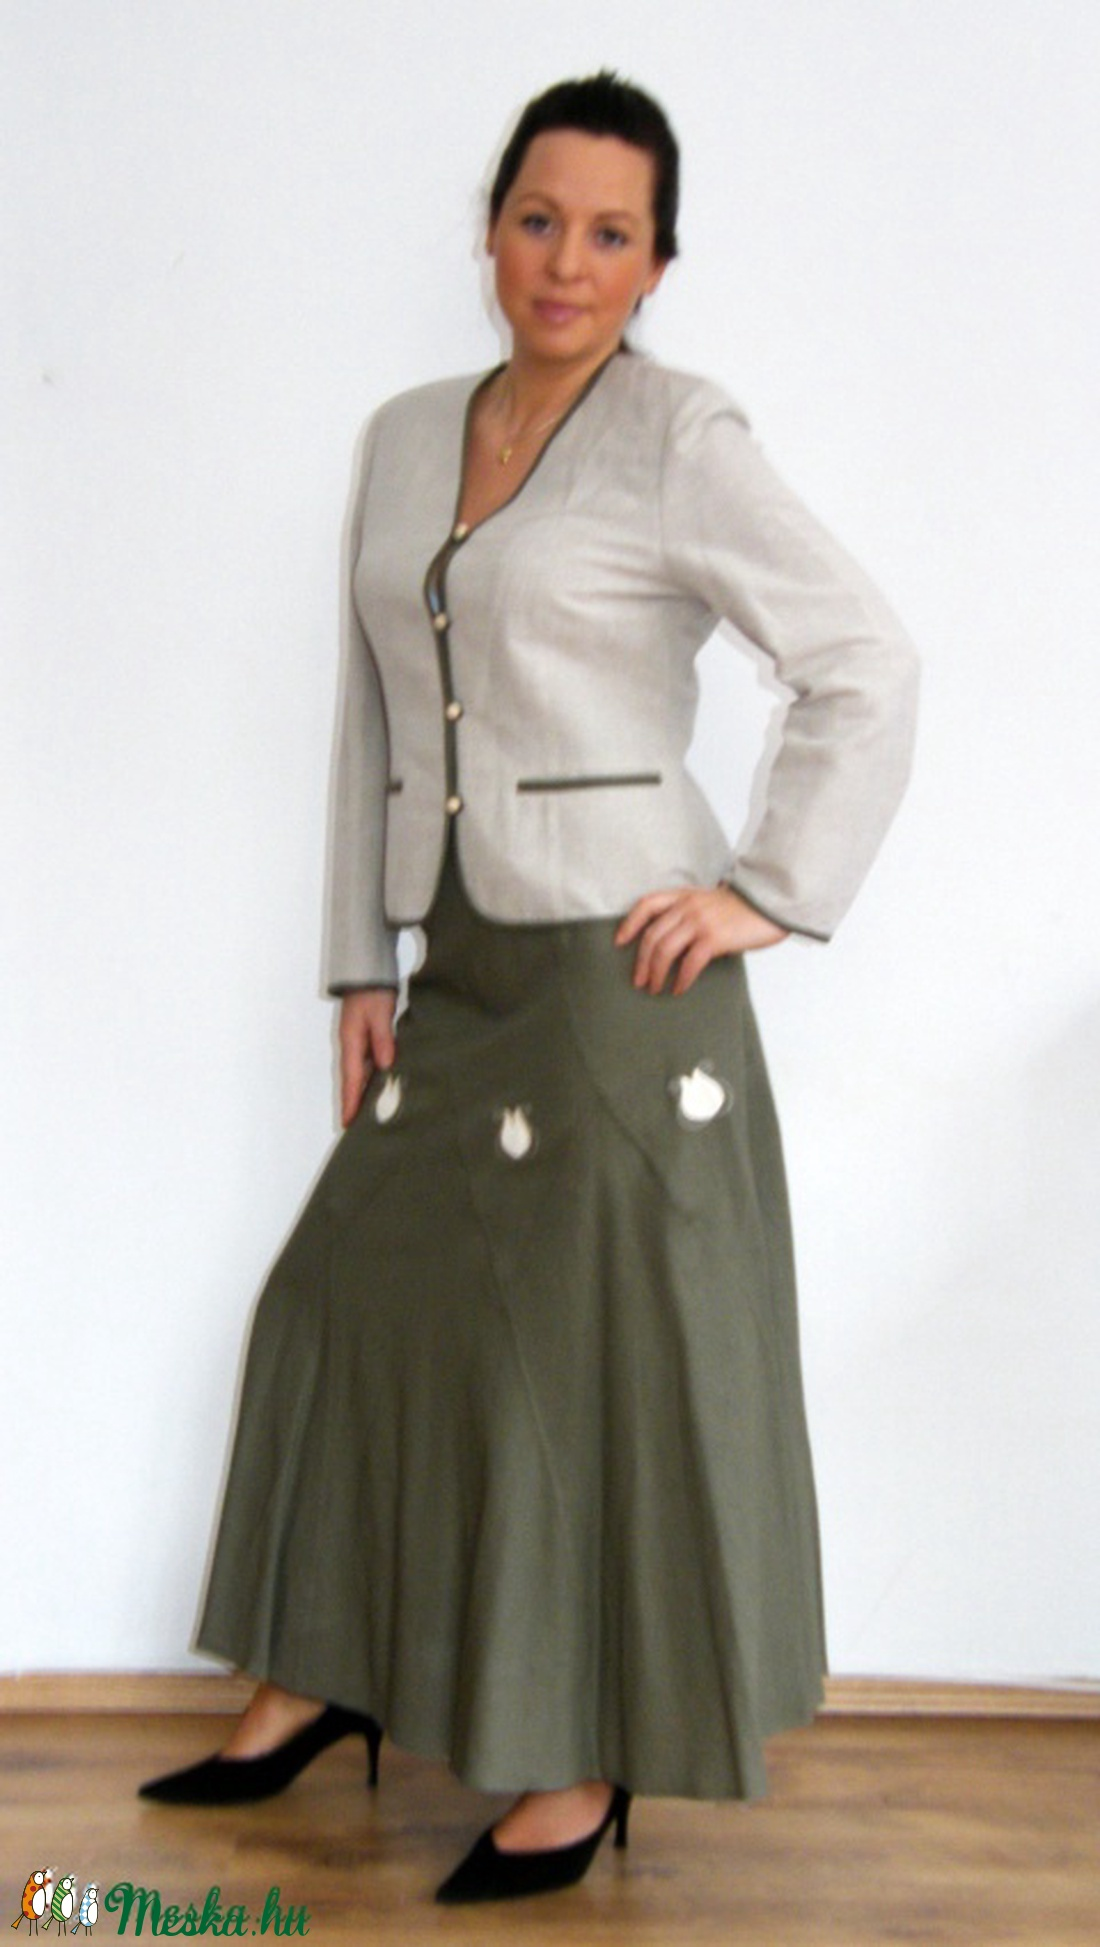 Tulipános kosztüm (Tulidesign) - Meska.hu ca5730a9e4